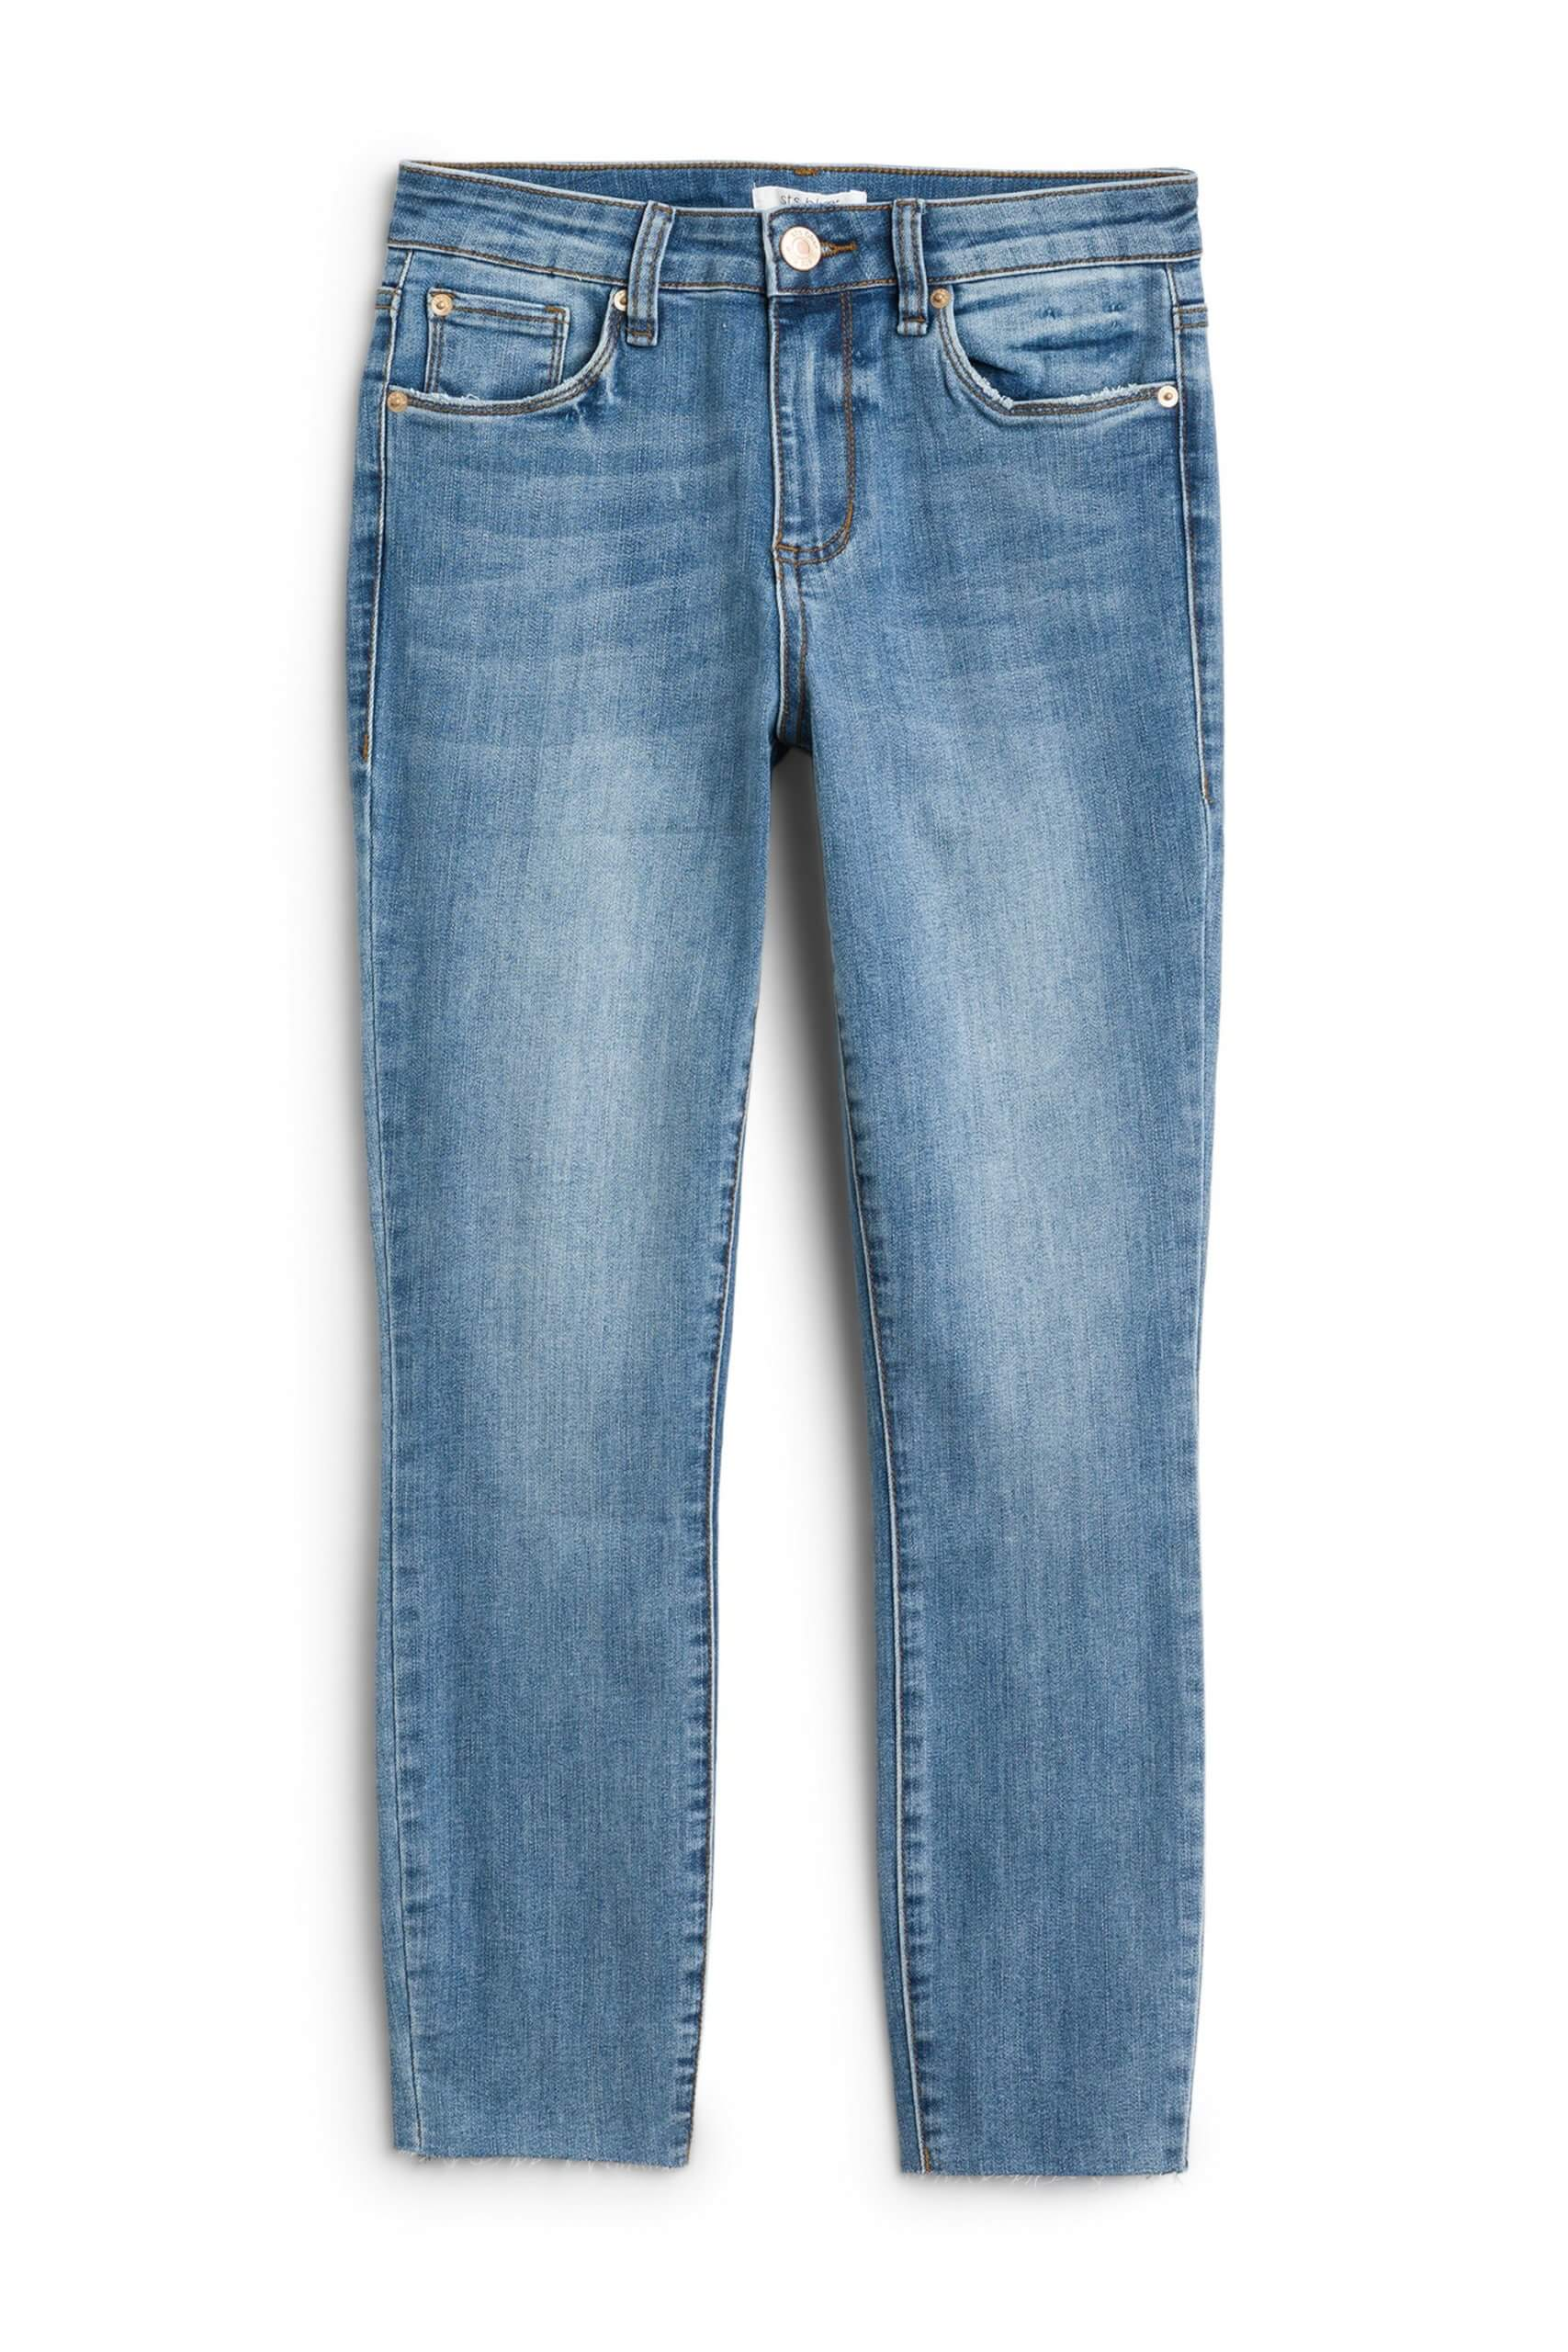 Stitch Fix Women's blue capri jeans.